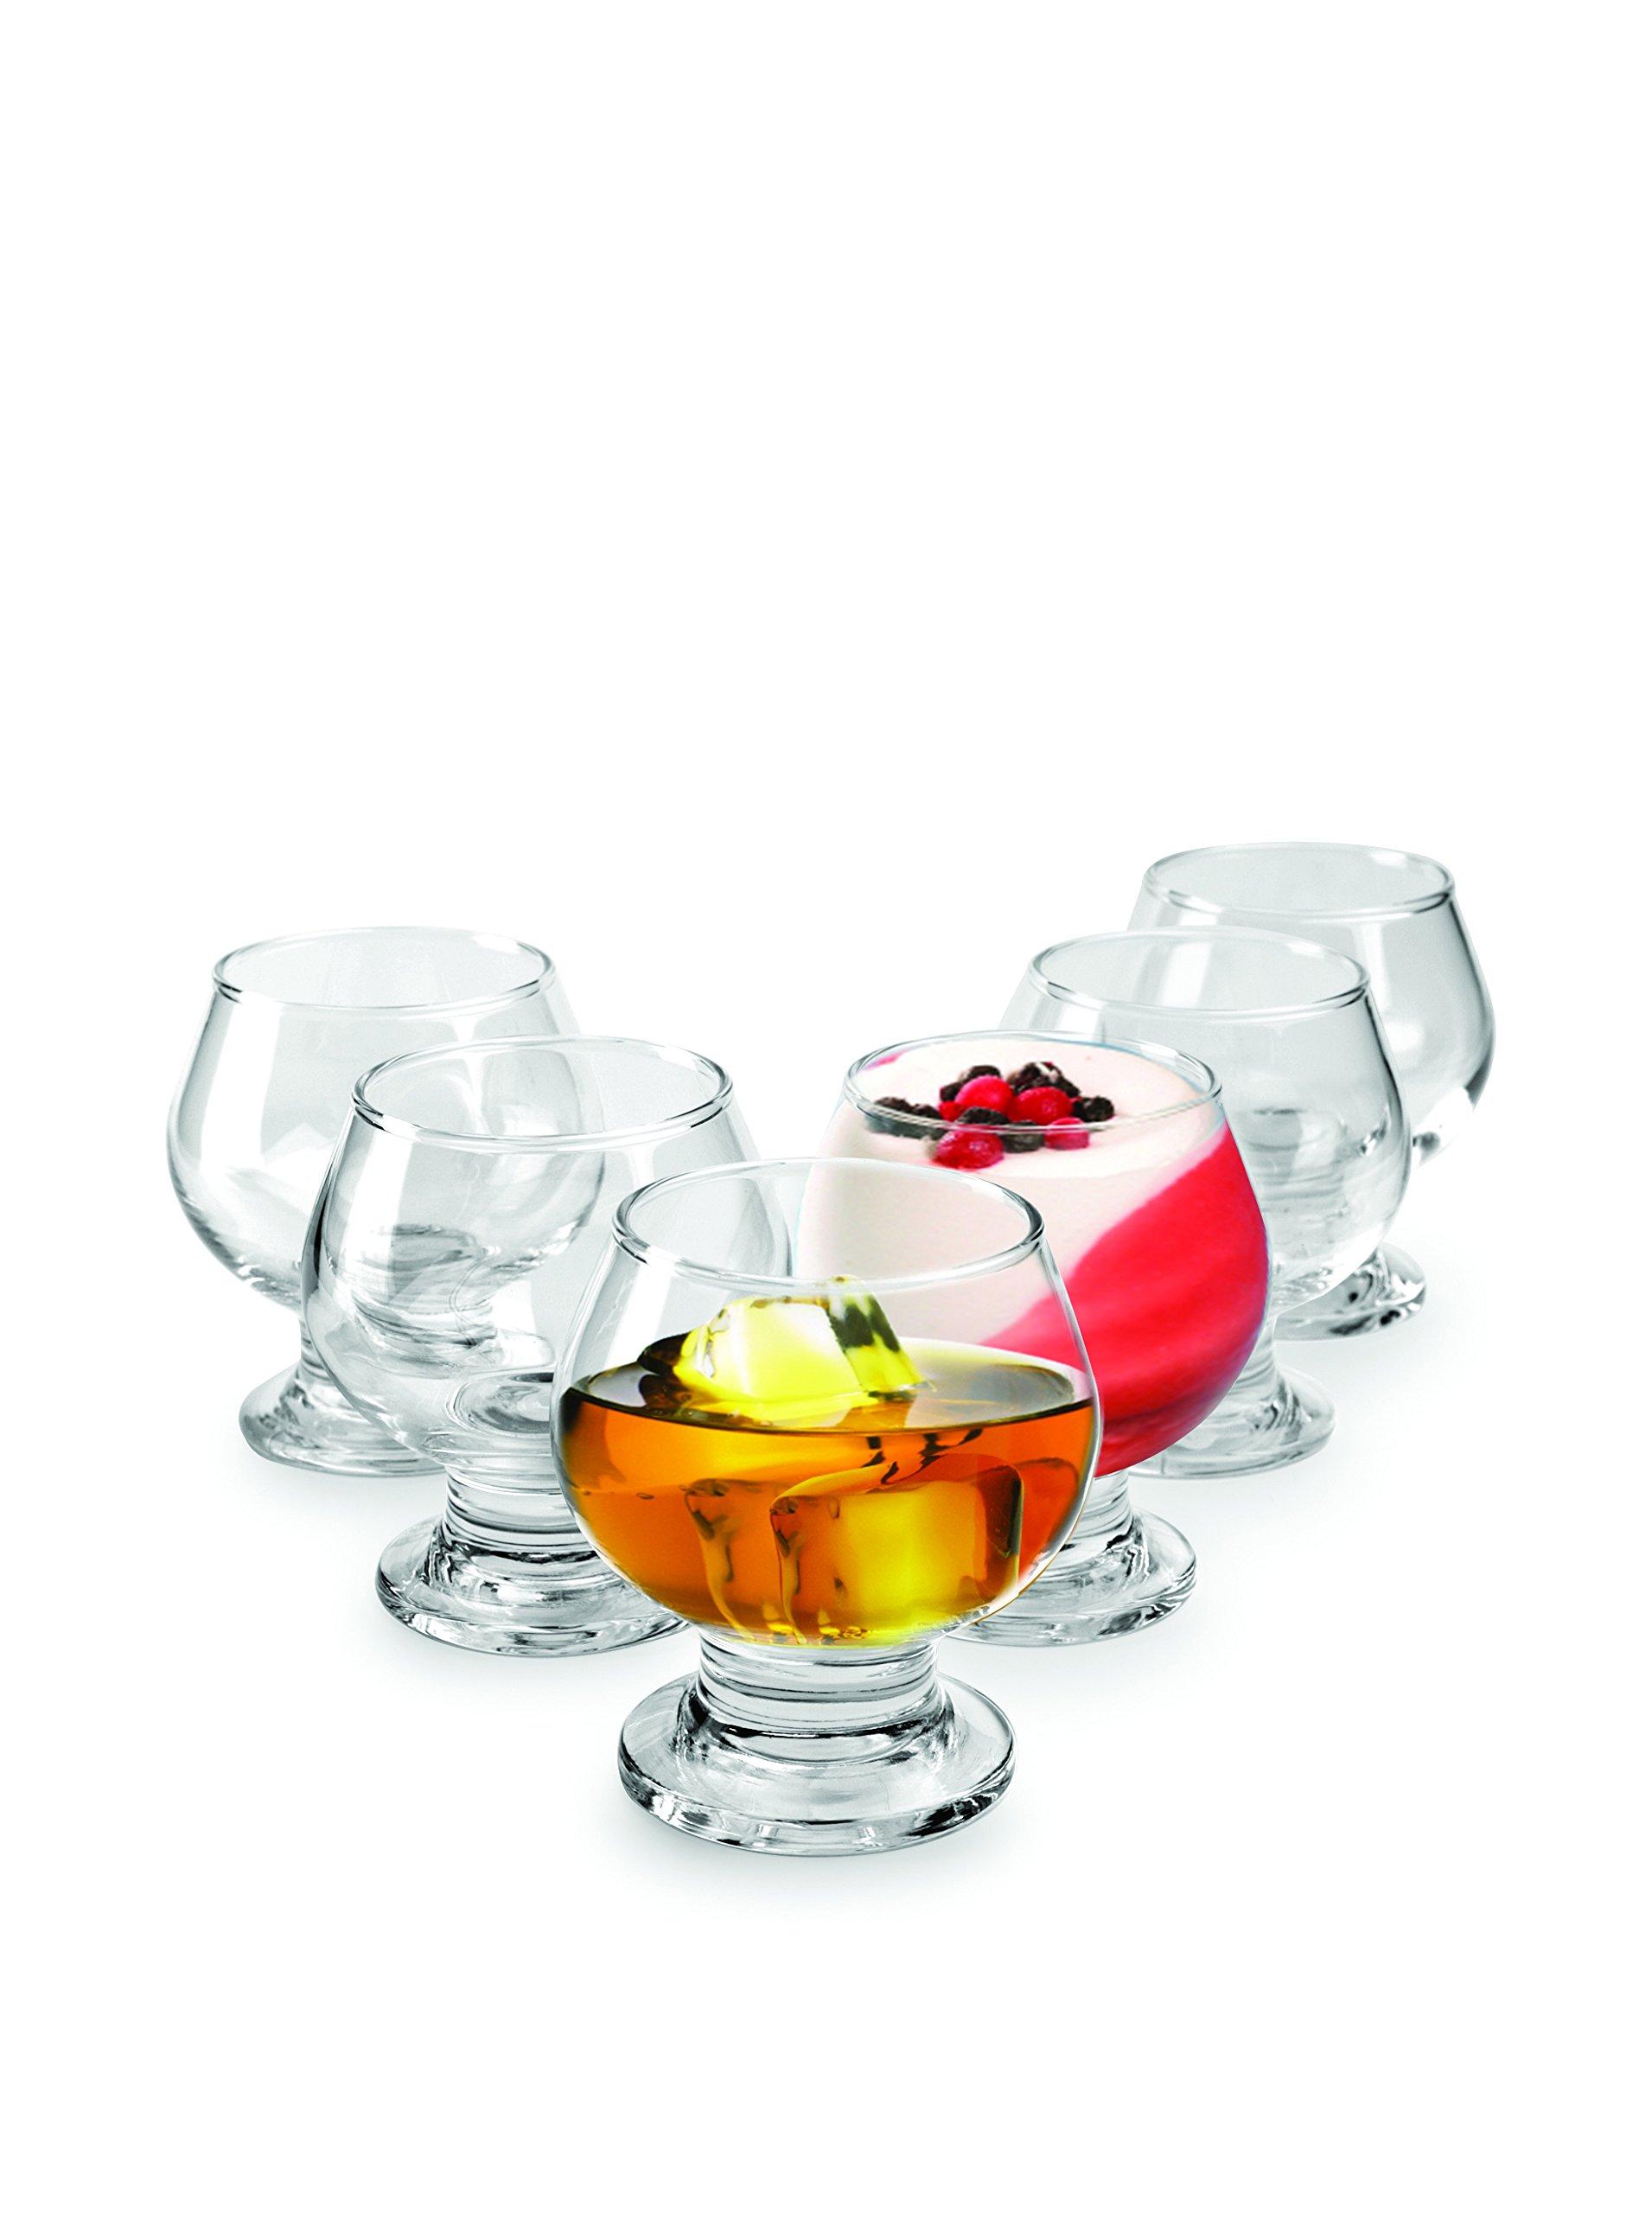 Samba 7 oz. Mini Dessert/Brandy Glass (Set of 6)